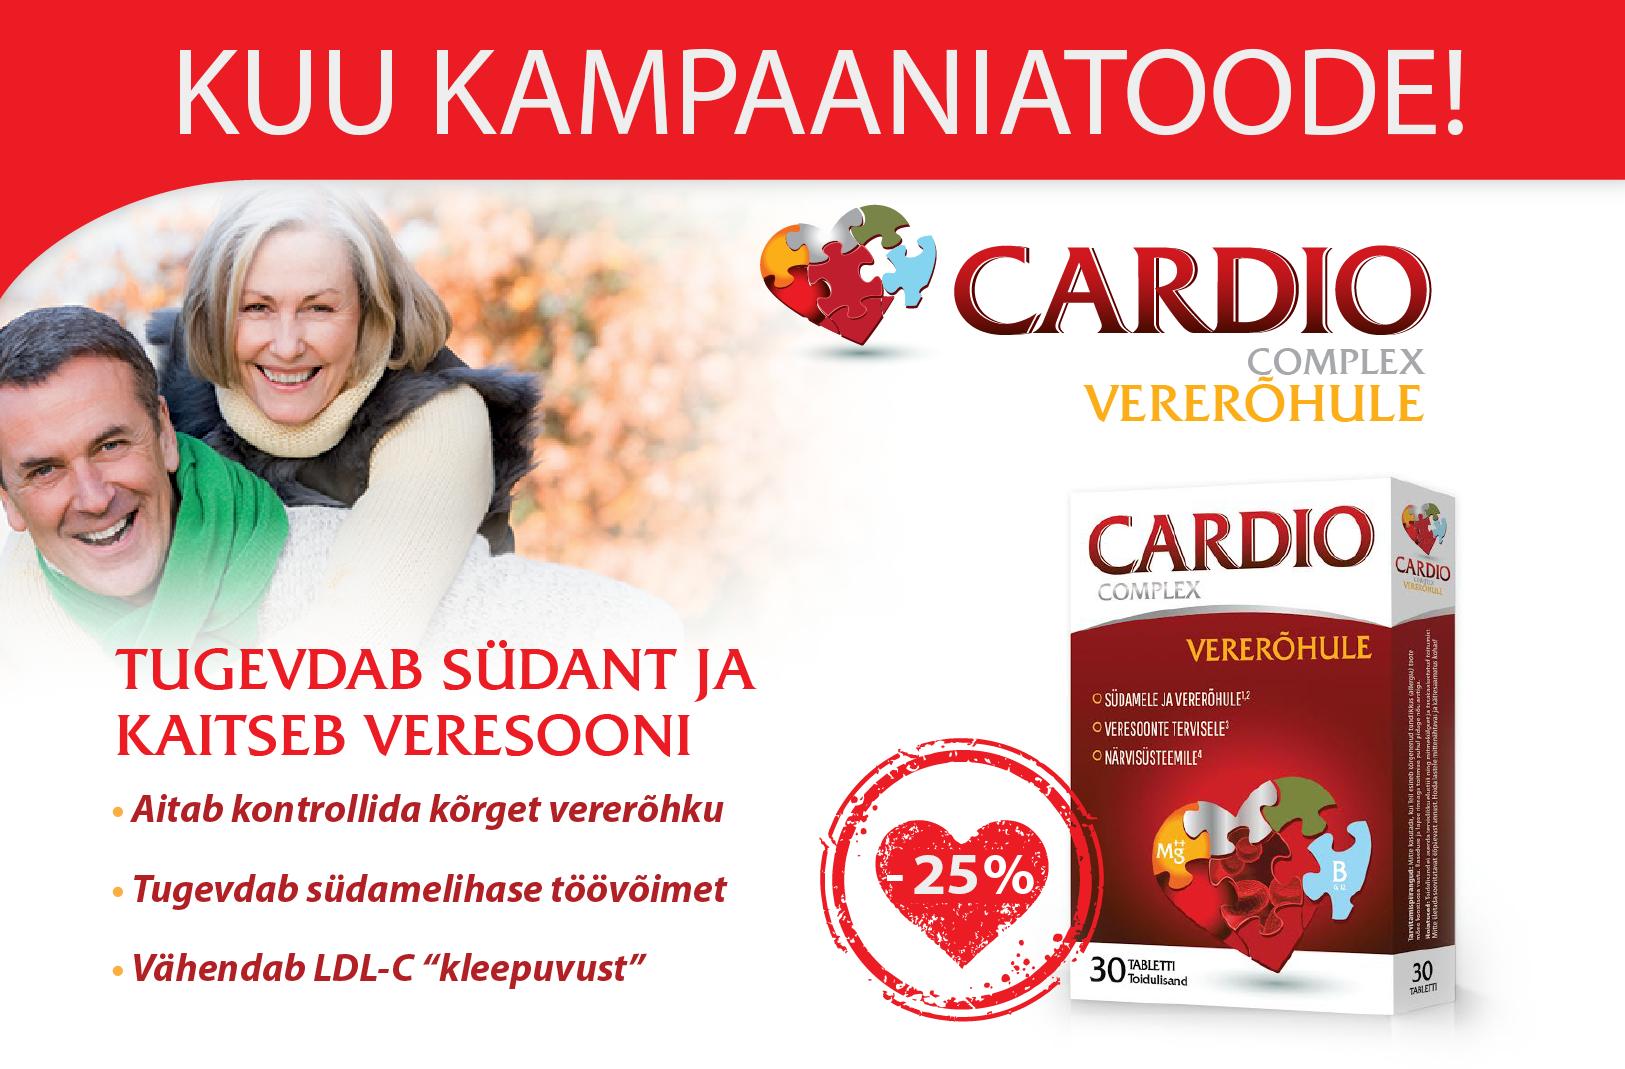 Cardio Complex Vererõhule 25